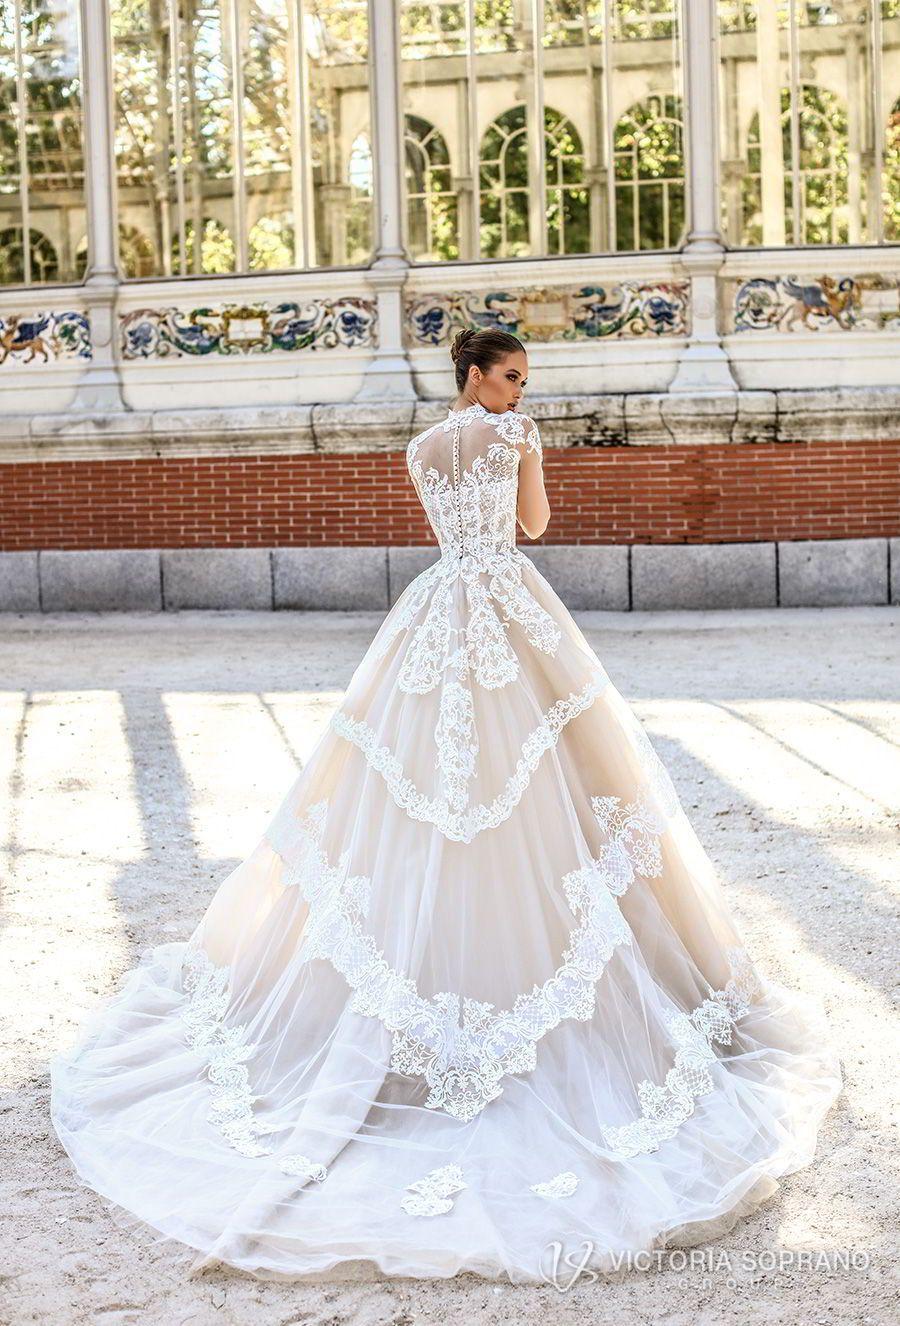 Victoria Soprano 2018 Wedding Dresses The One Bridal Collection Wedding Inspirasi Wedding Dresses Lace Wedding Dresses Dream Wedding Dresses [ 1326 x 900 Pixel ]